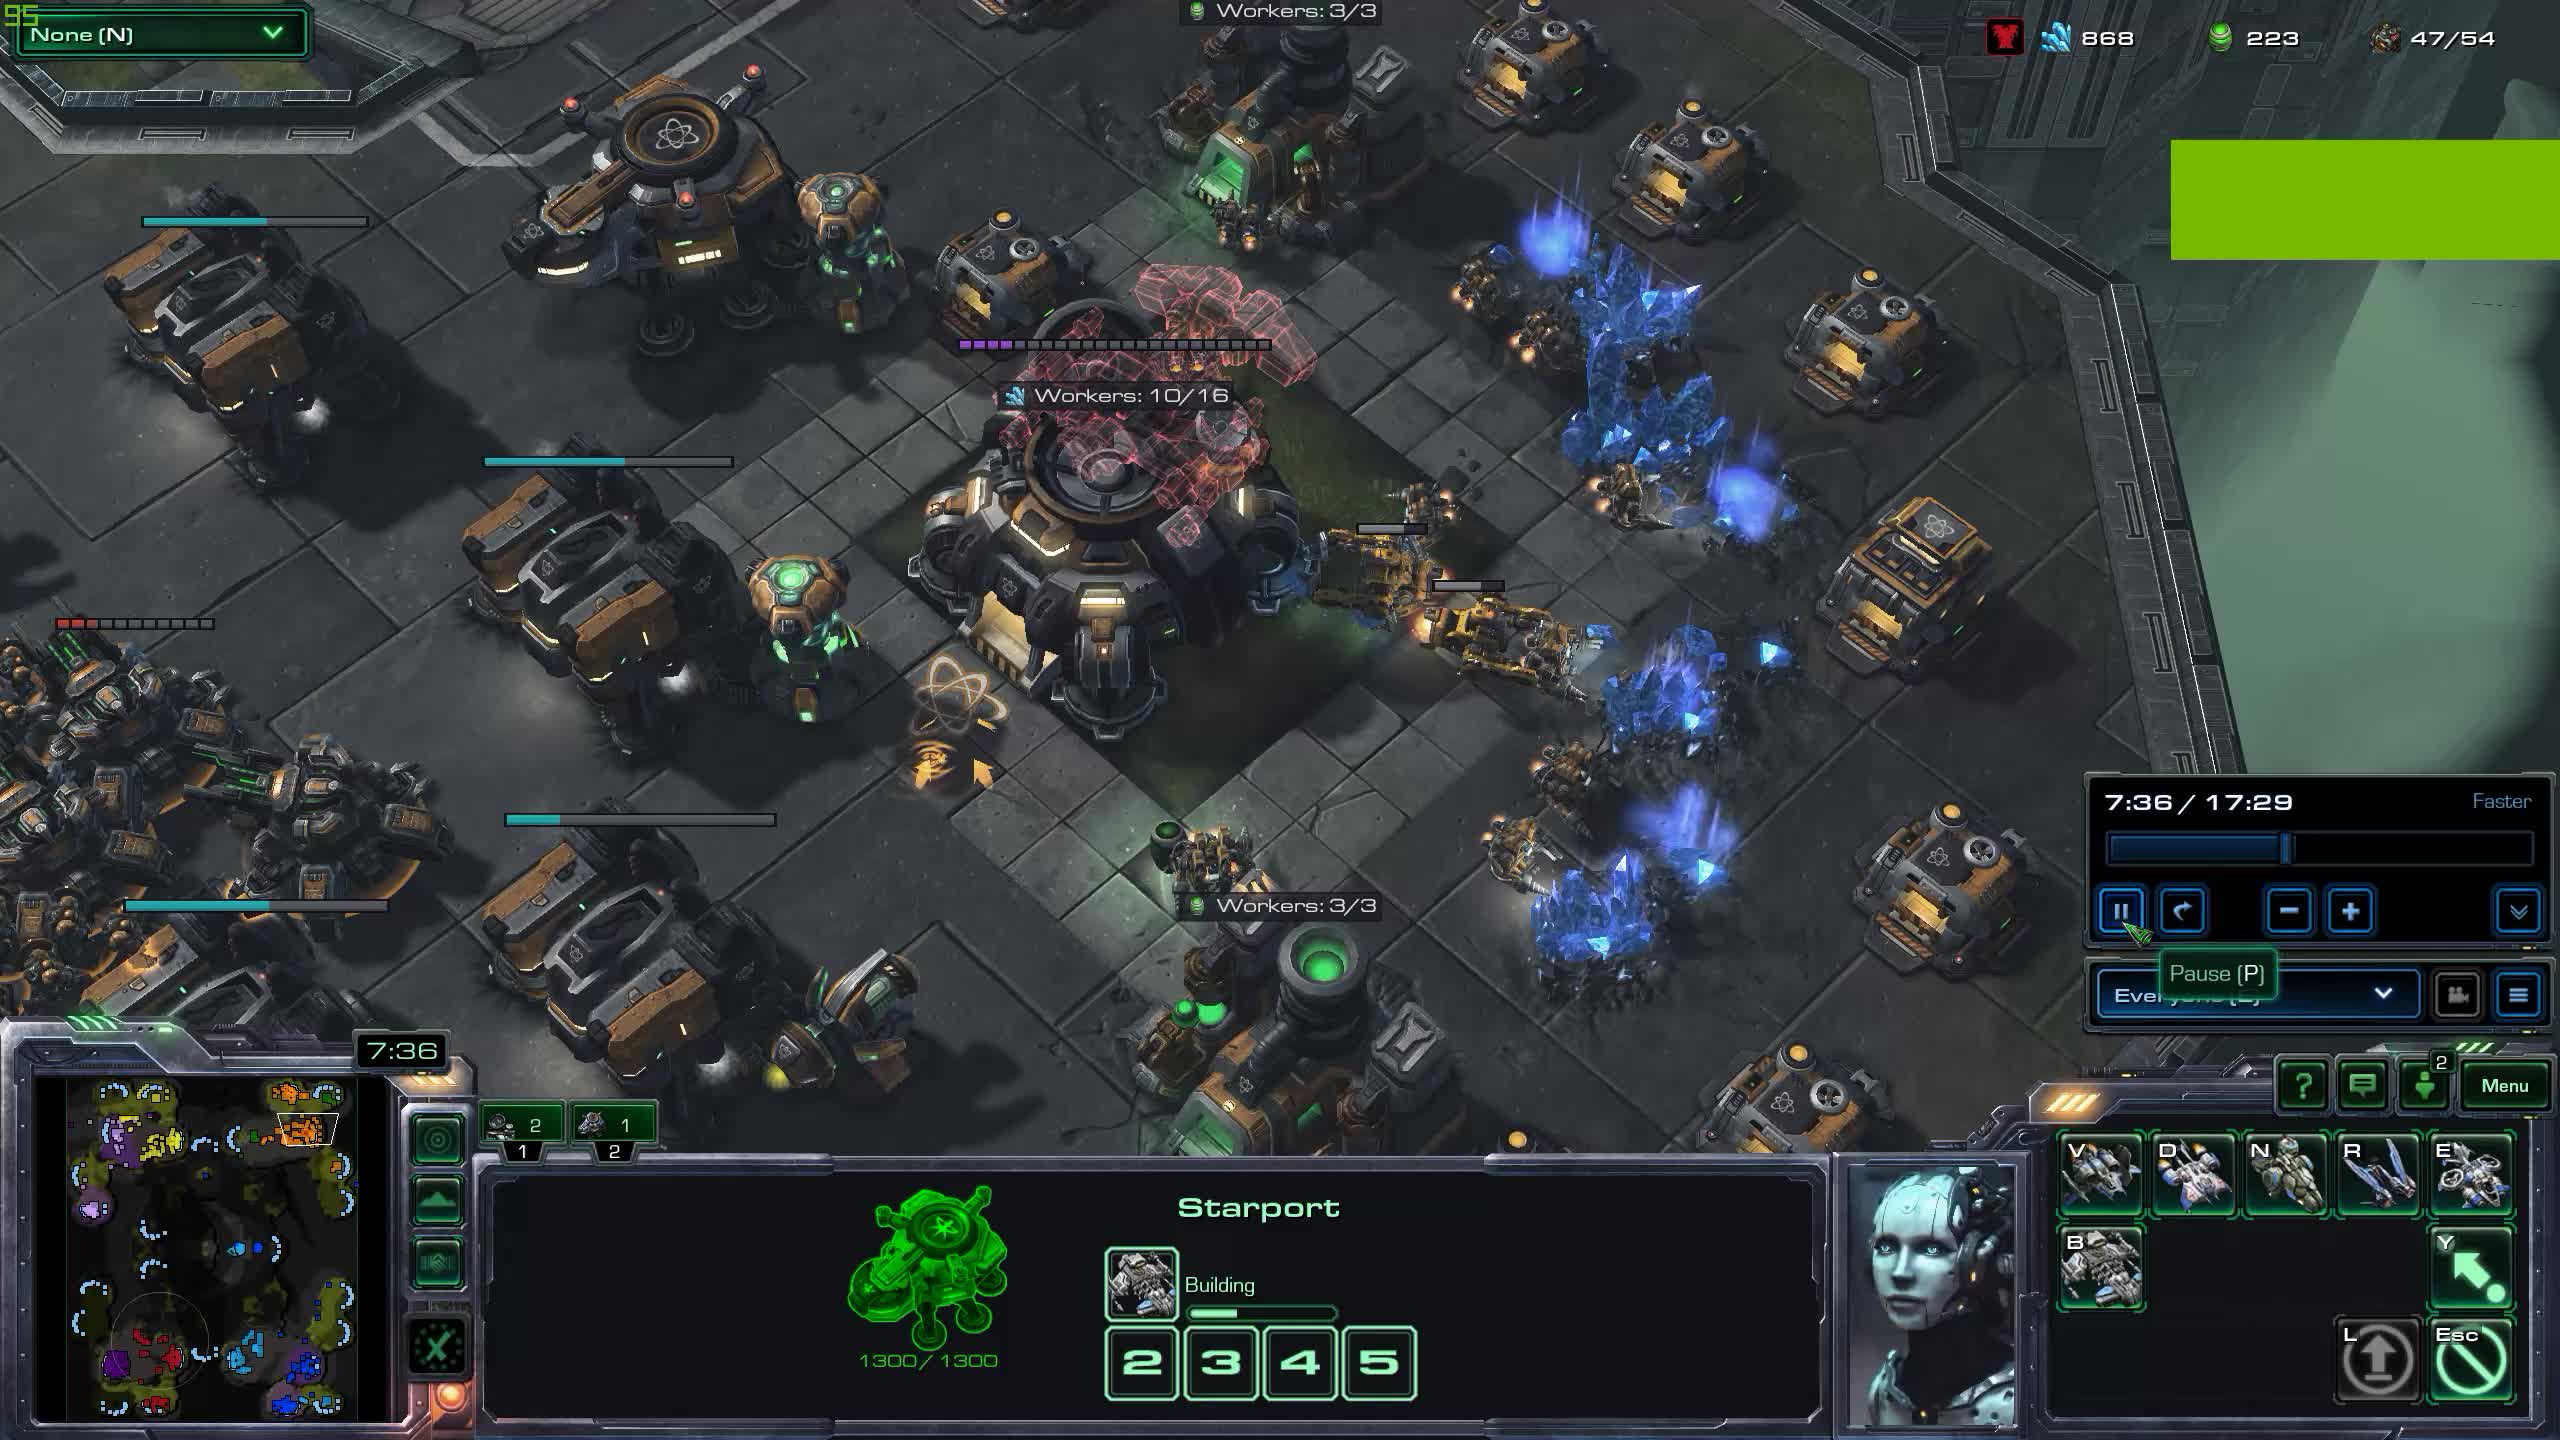 starcraftii, StarCraft II 2018.12.10 - 18.28.43.08 GIFs